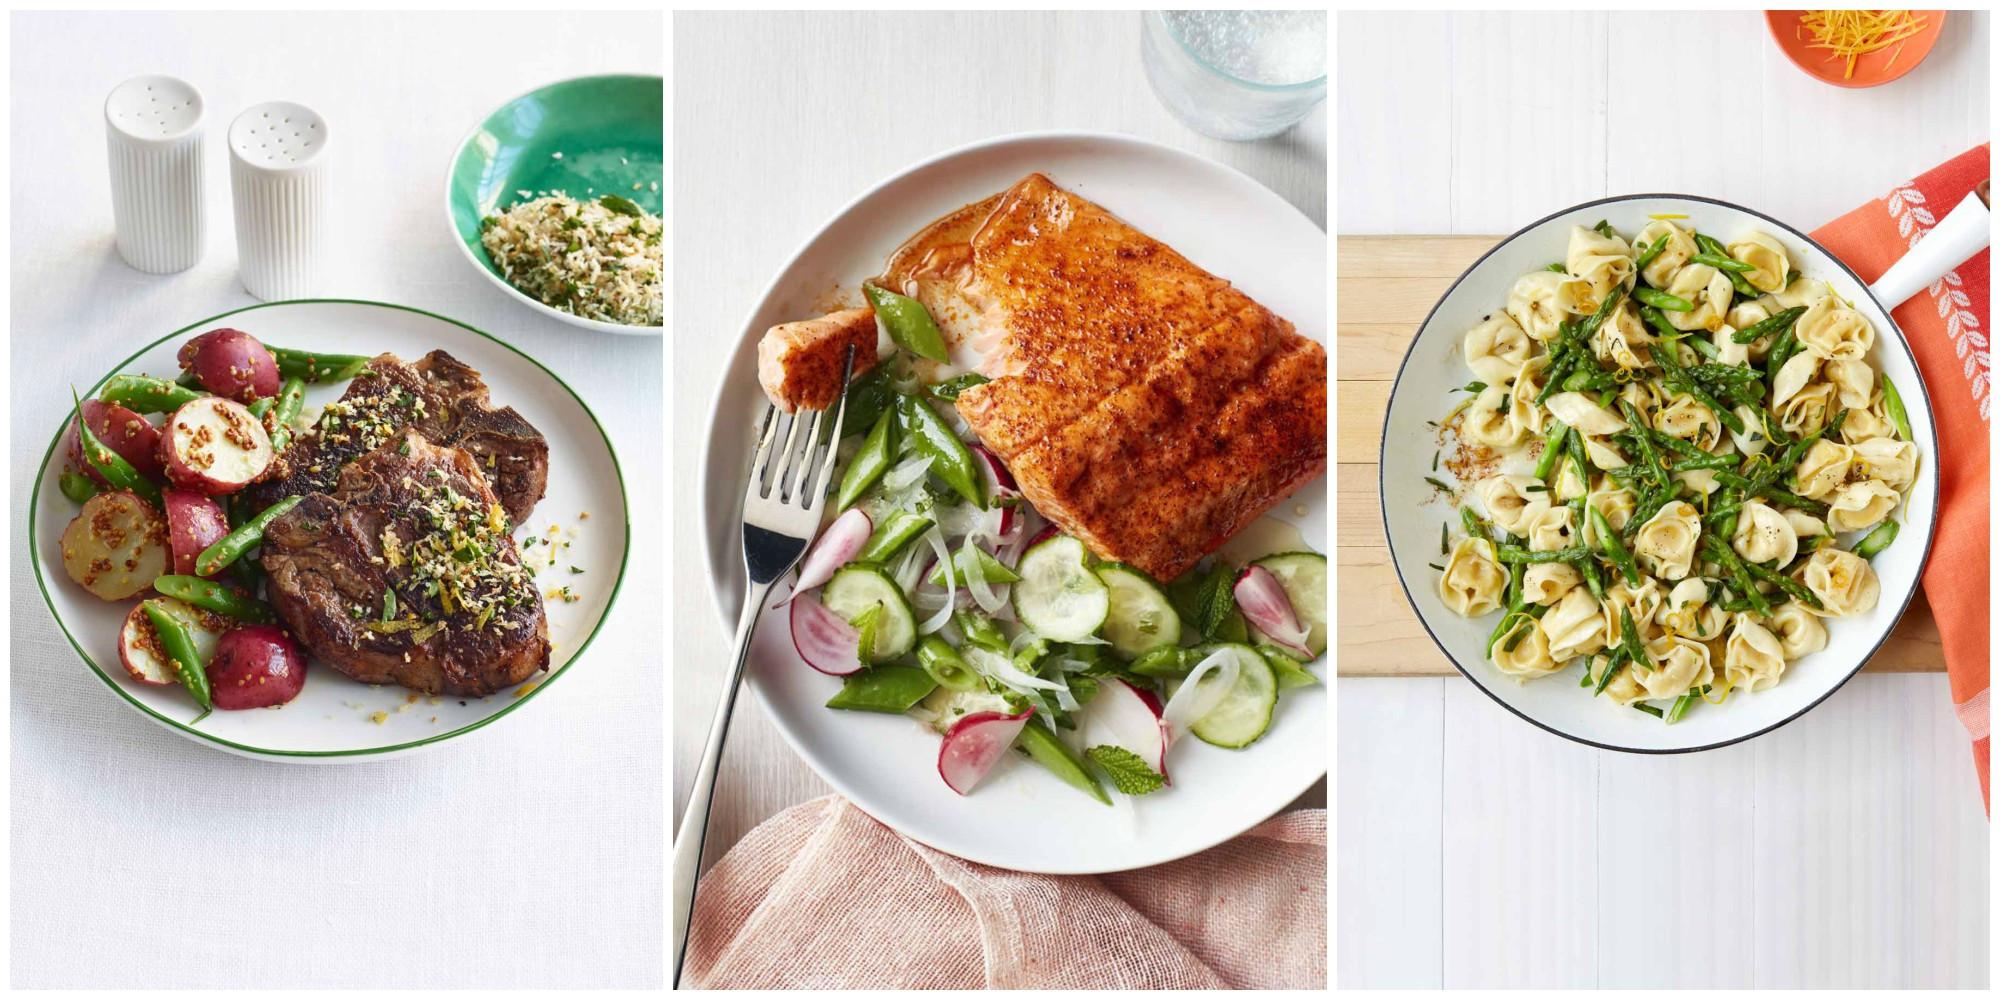 Mothers Day Dinner Ideas  11 Easy Mother s Day Dinner Recipes Best Dinner Ideas